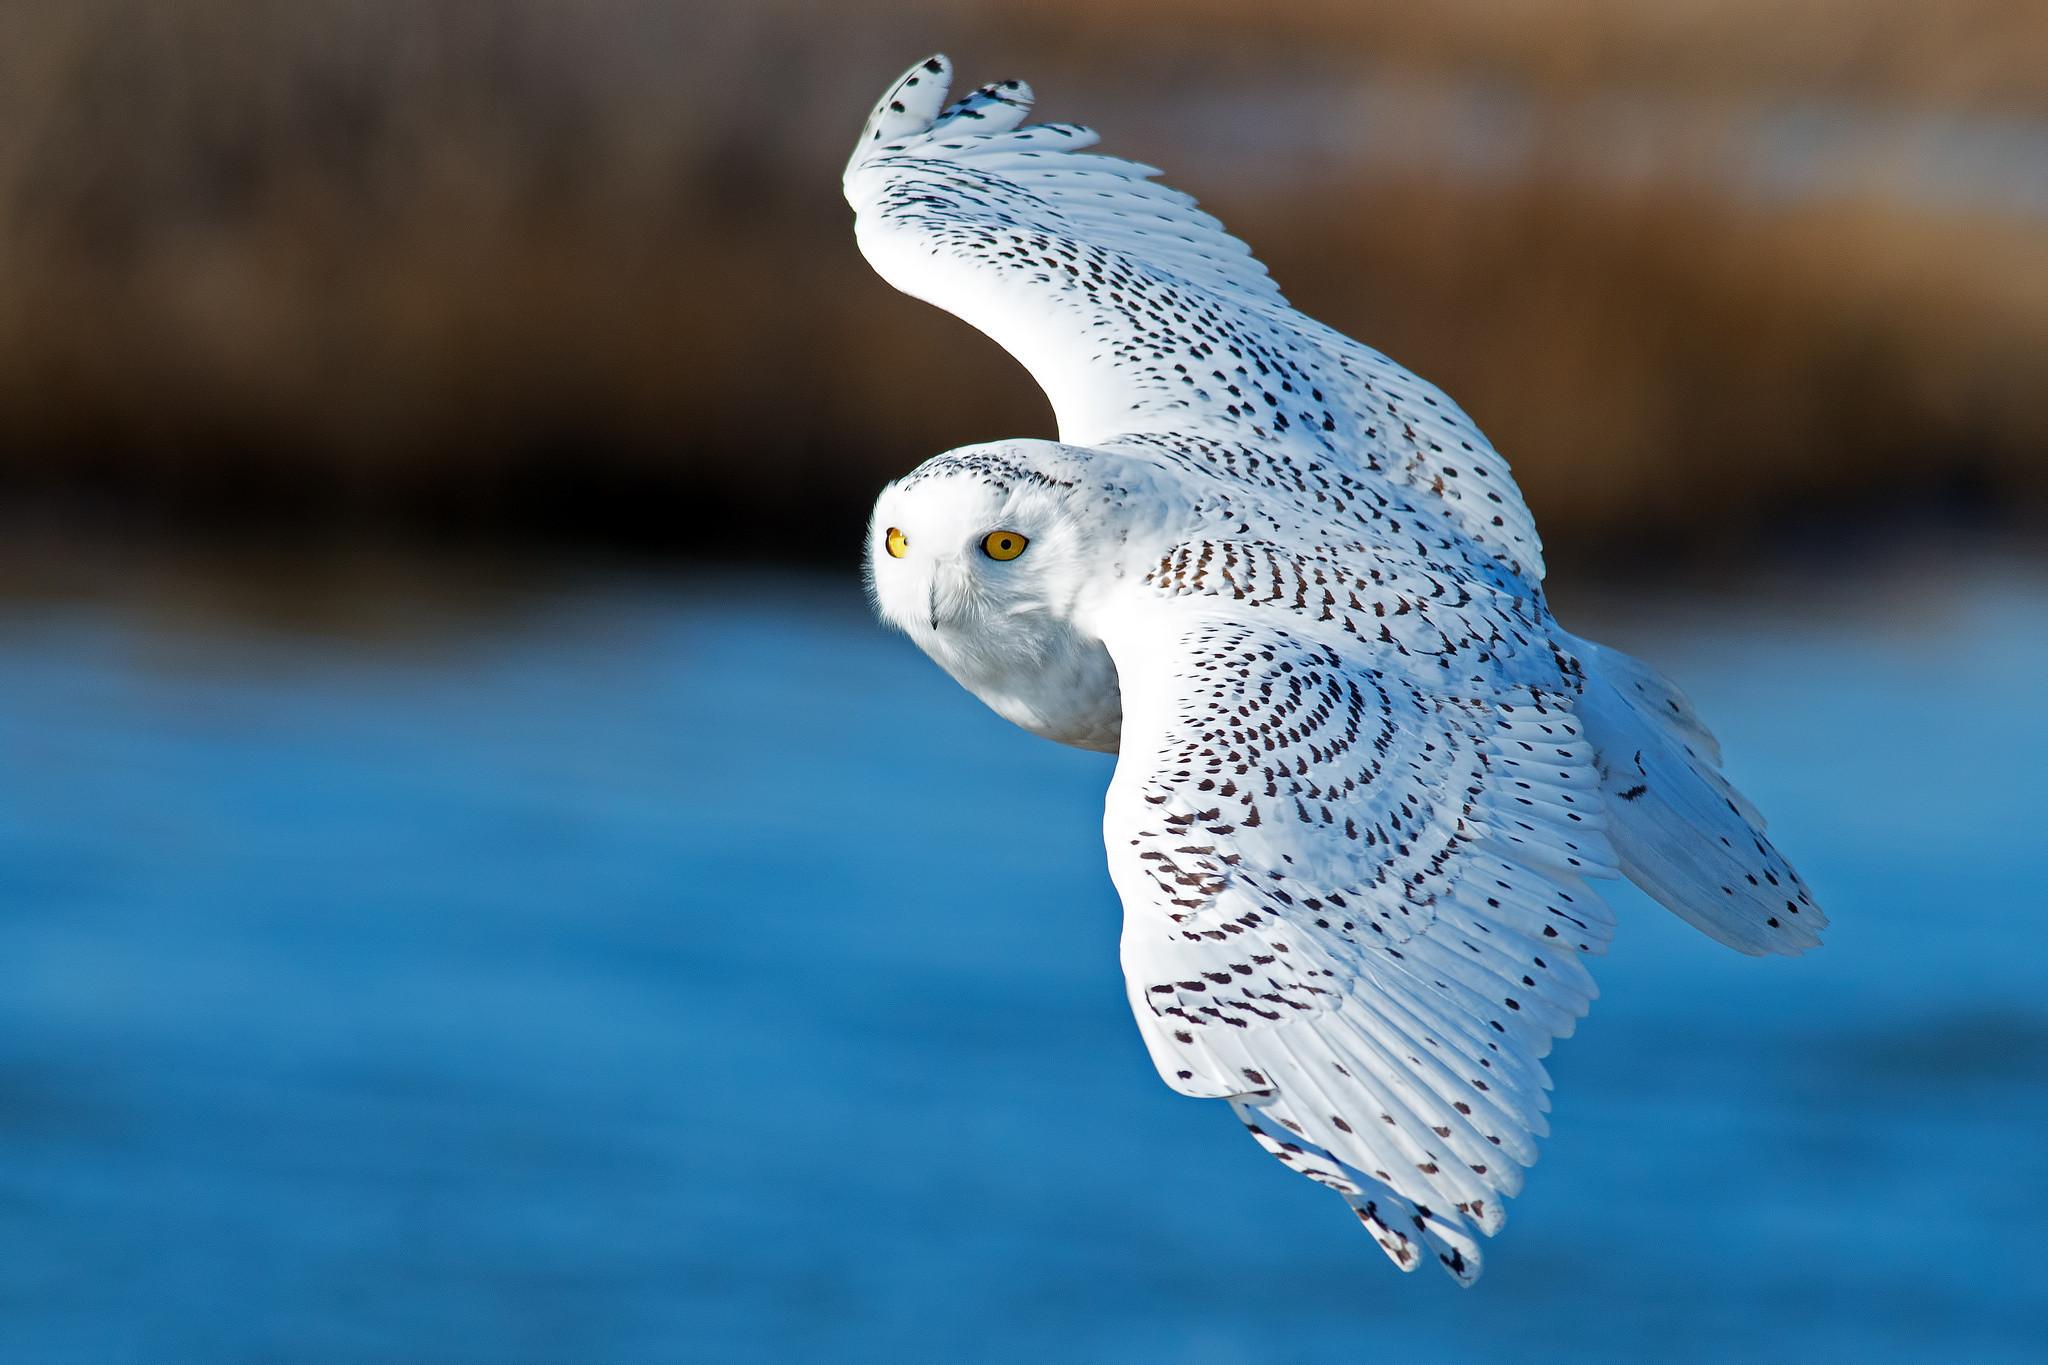 wings, White owl, flying, bird, snowy owl